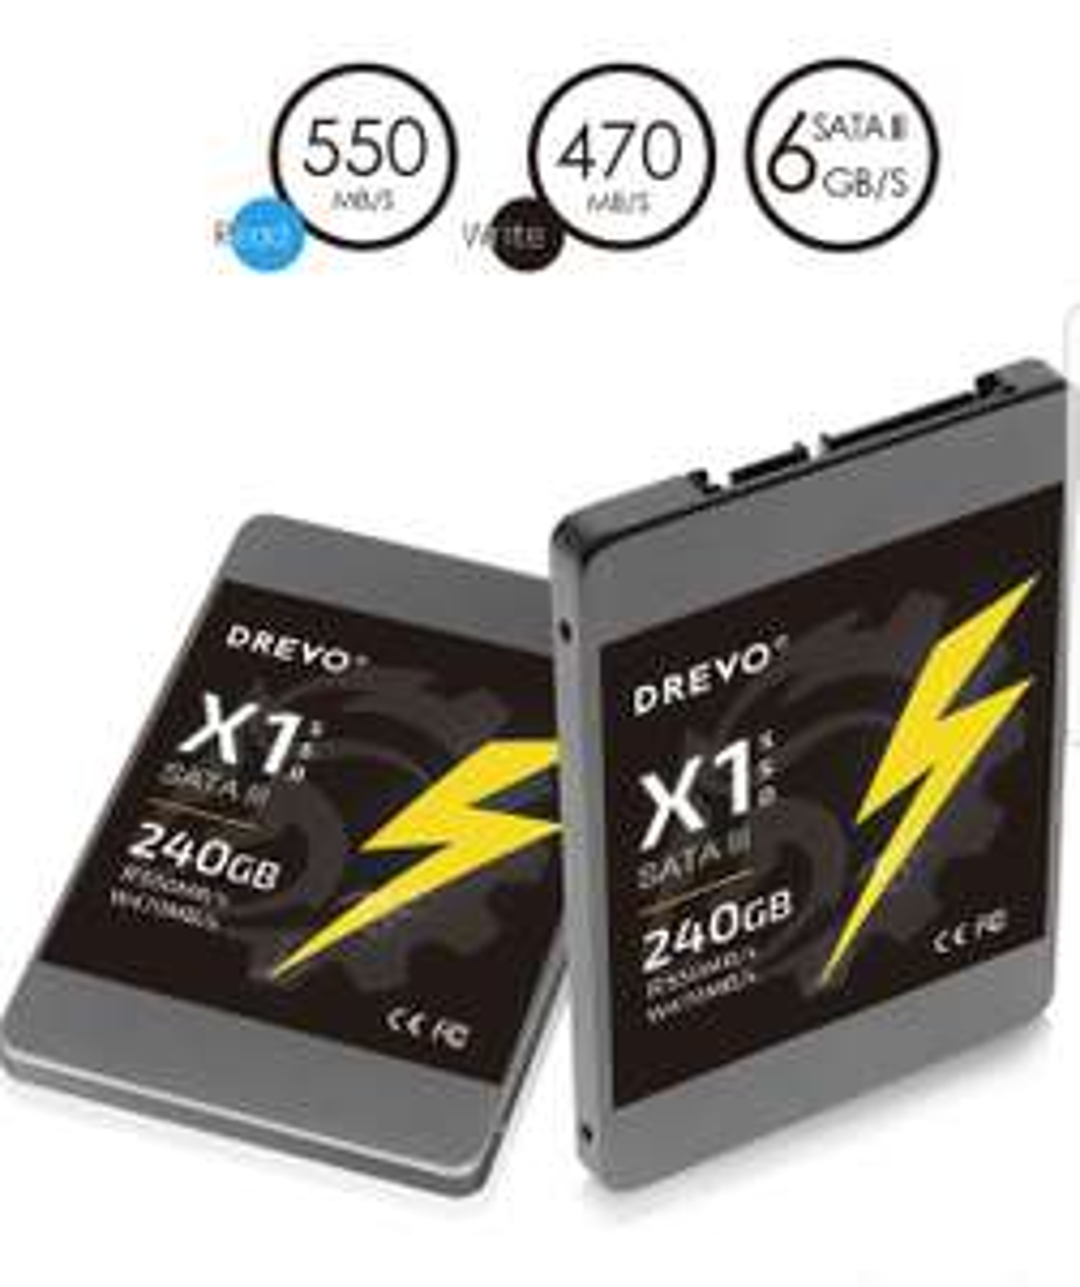 [Amazon.Blitzangebot] Drevo x1Series 240GB SSD 2,5Solid State Drive SATA3Lesen 550MB/s Schreiben 470m/s